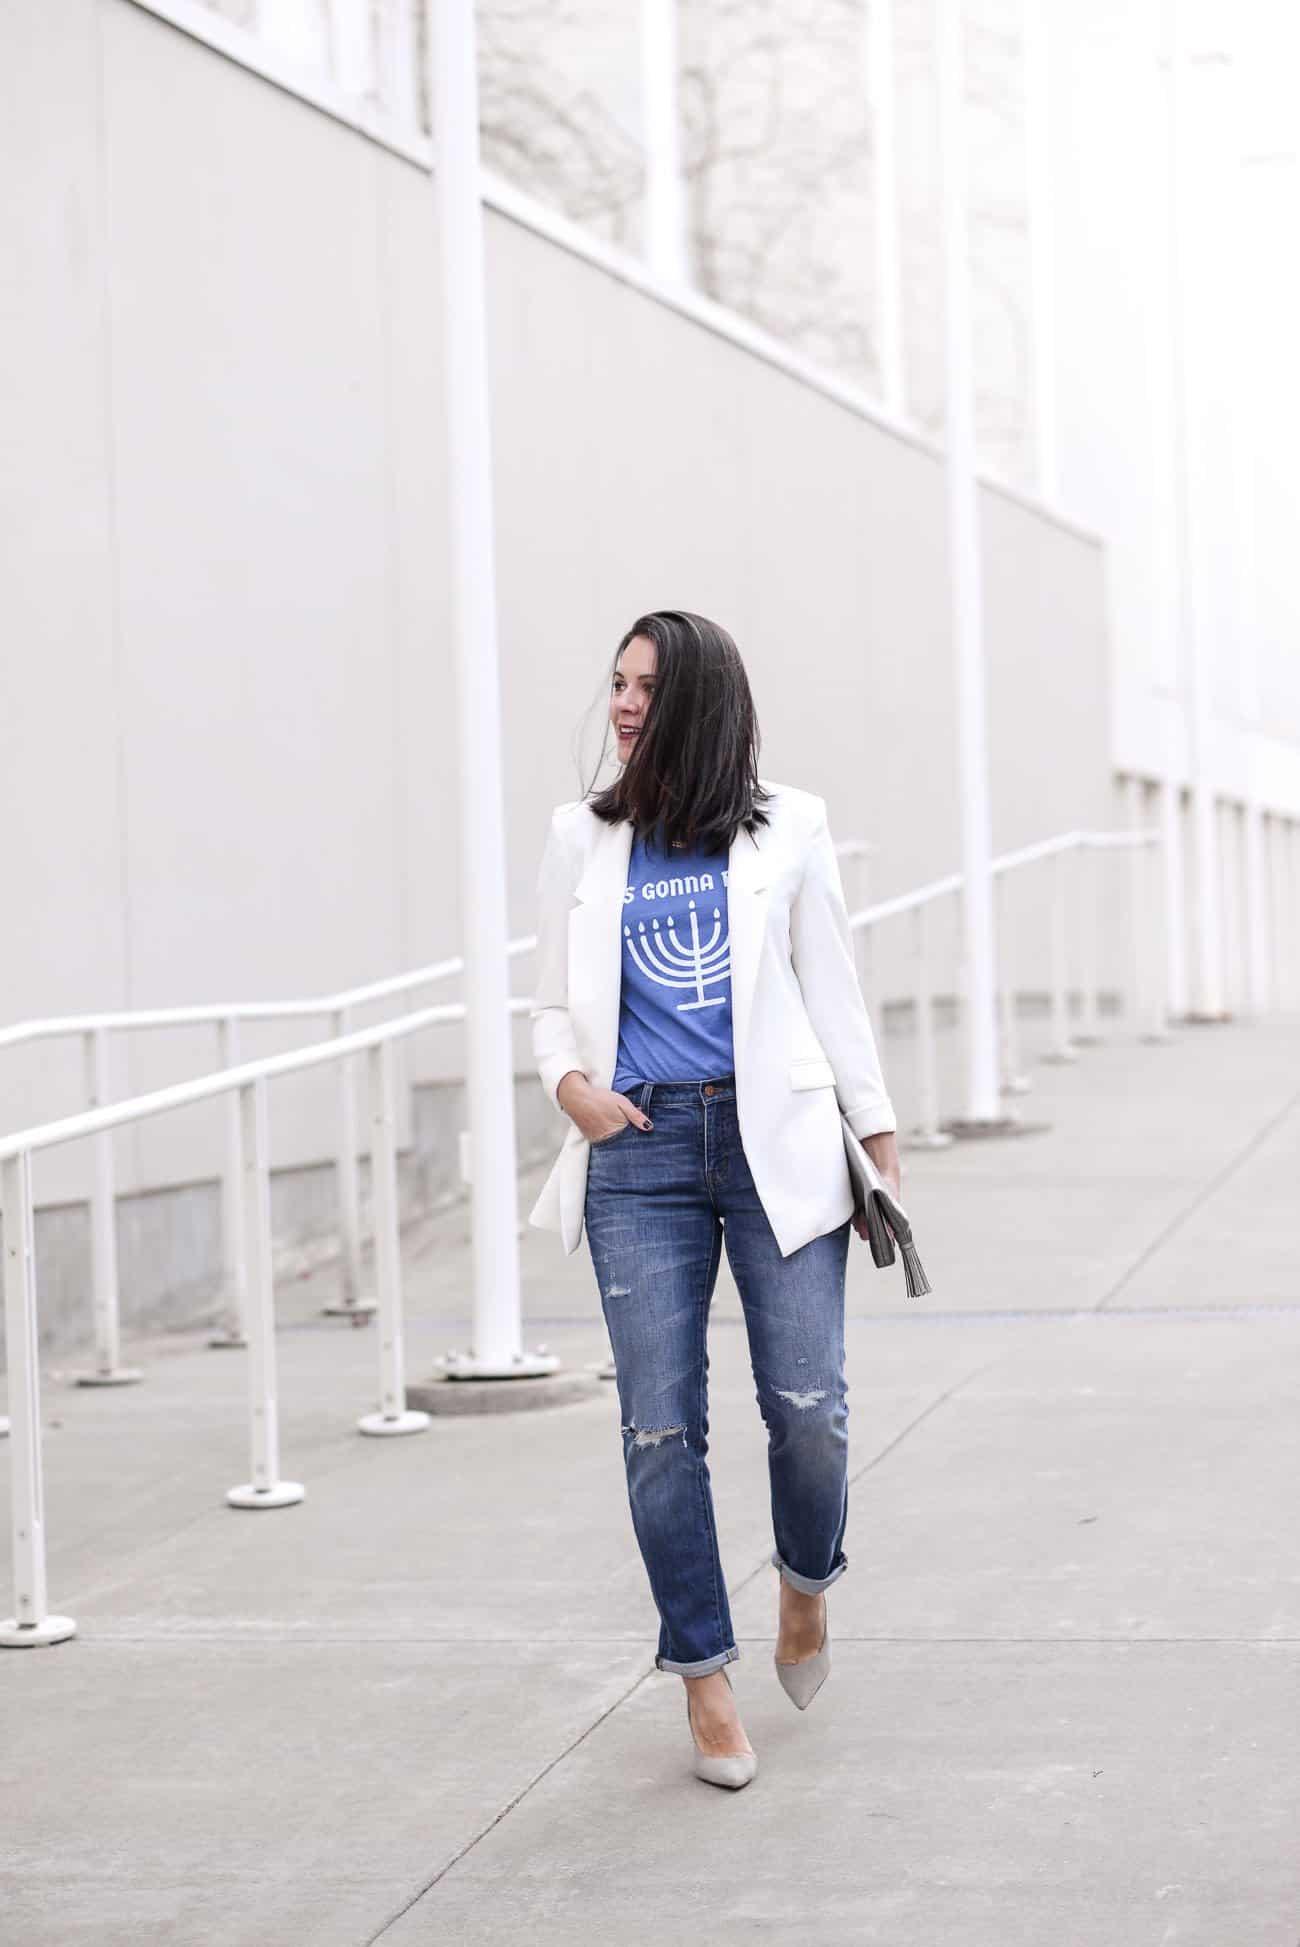 Hanukah T Shirt, Hanukah Party Outfit Ideas - My Style Vita @mystylevita